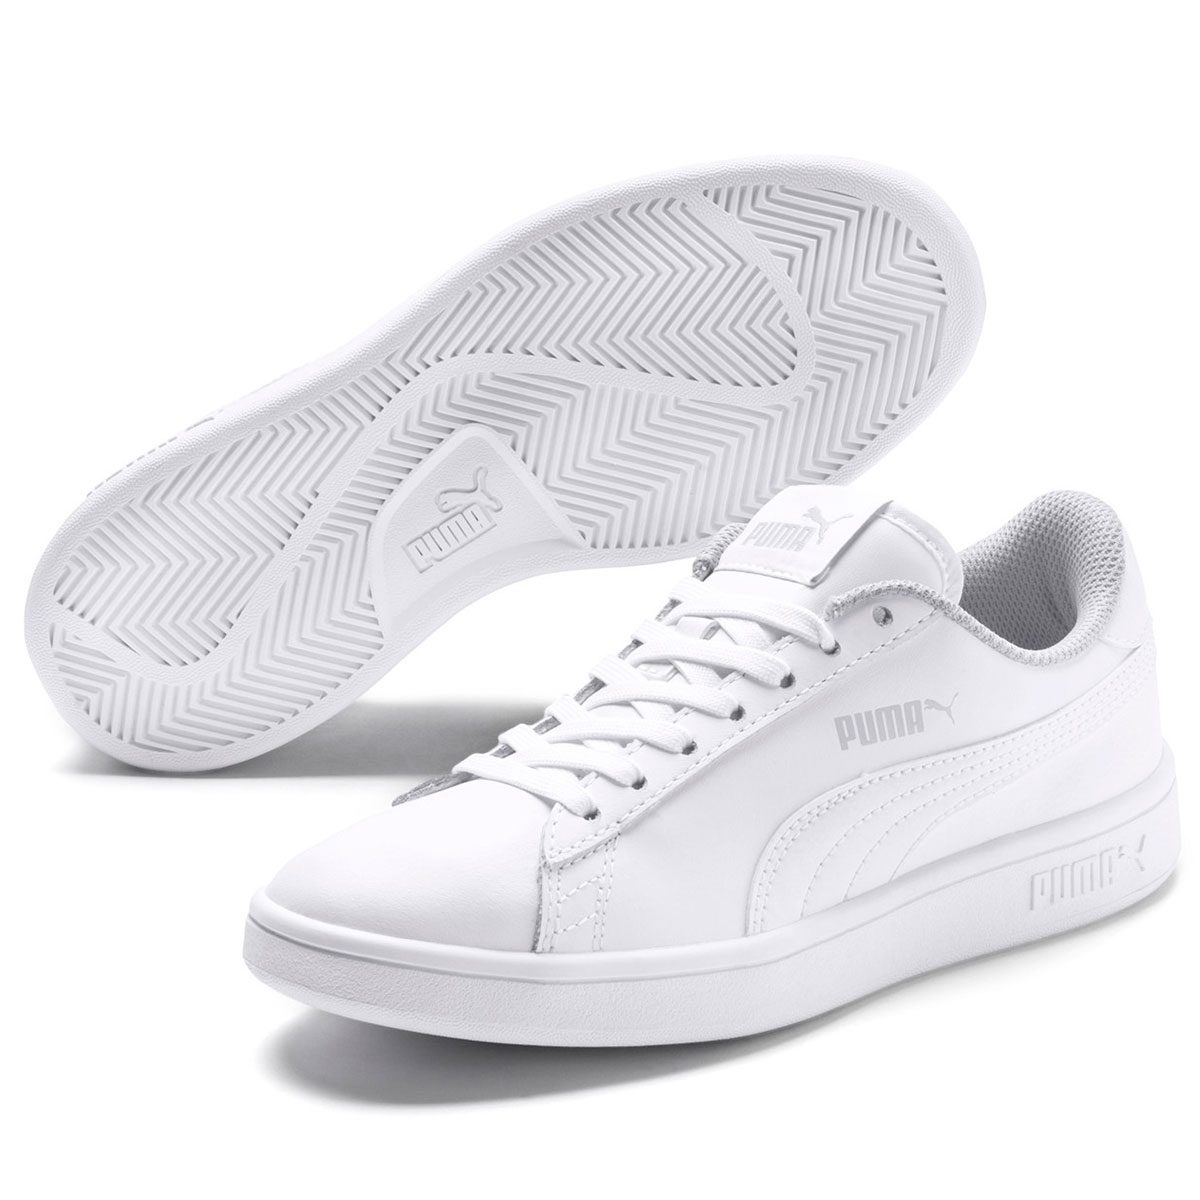 Puma Boys' Smash V2 L Jr Sneakers - White, 5.5